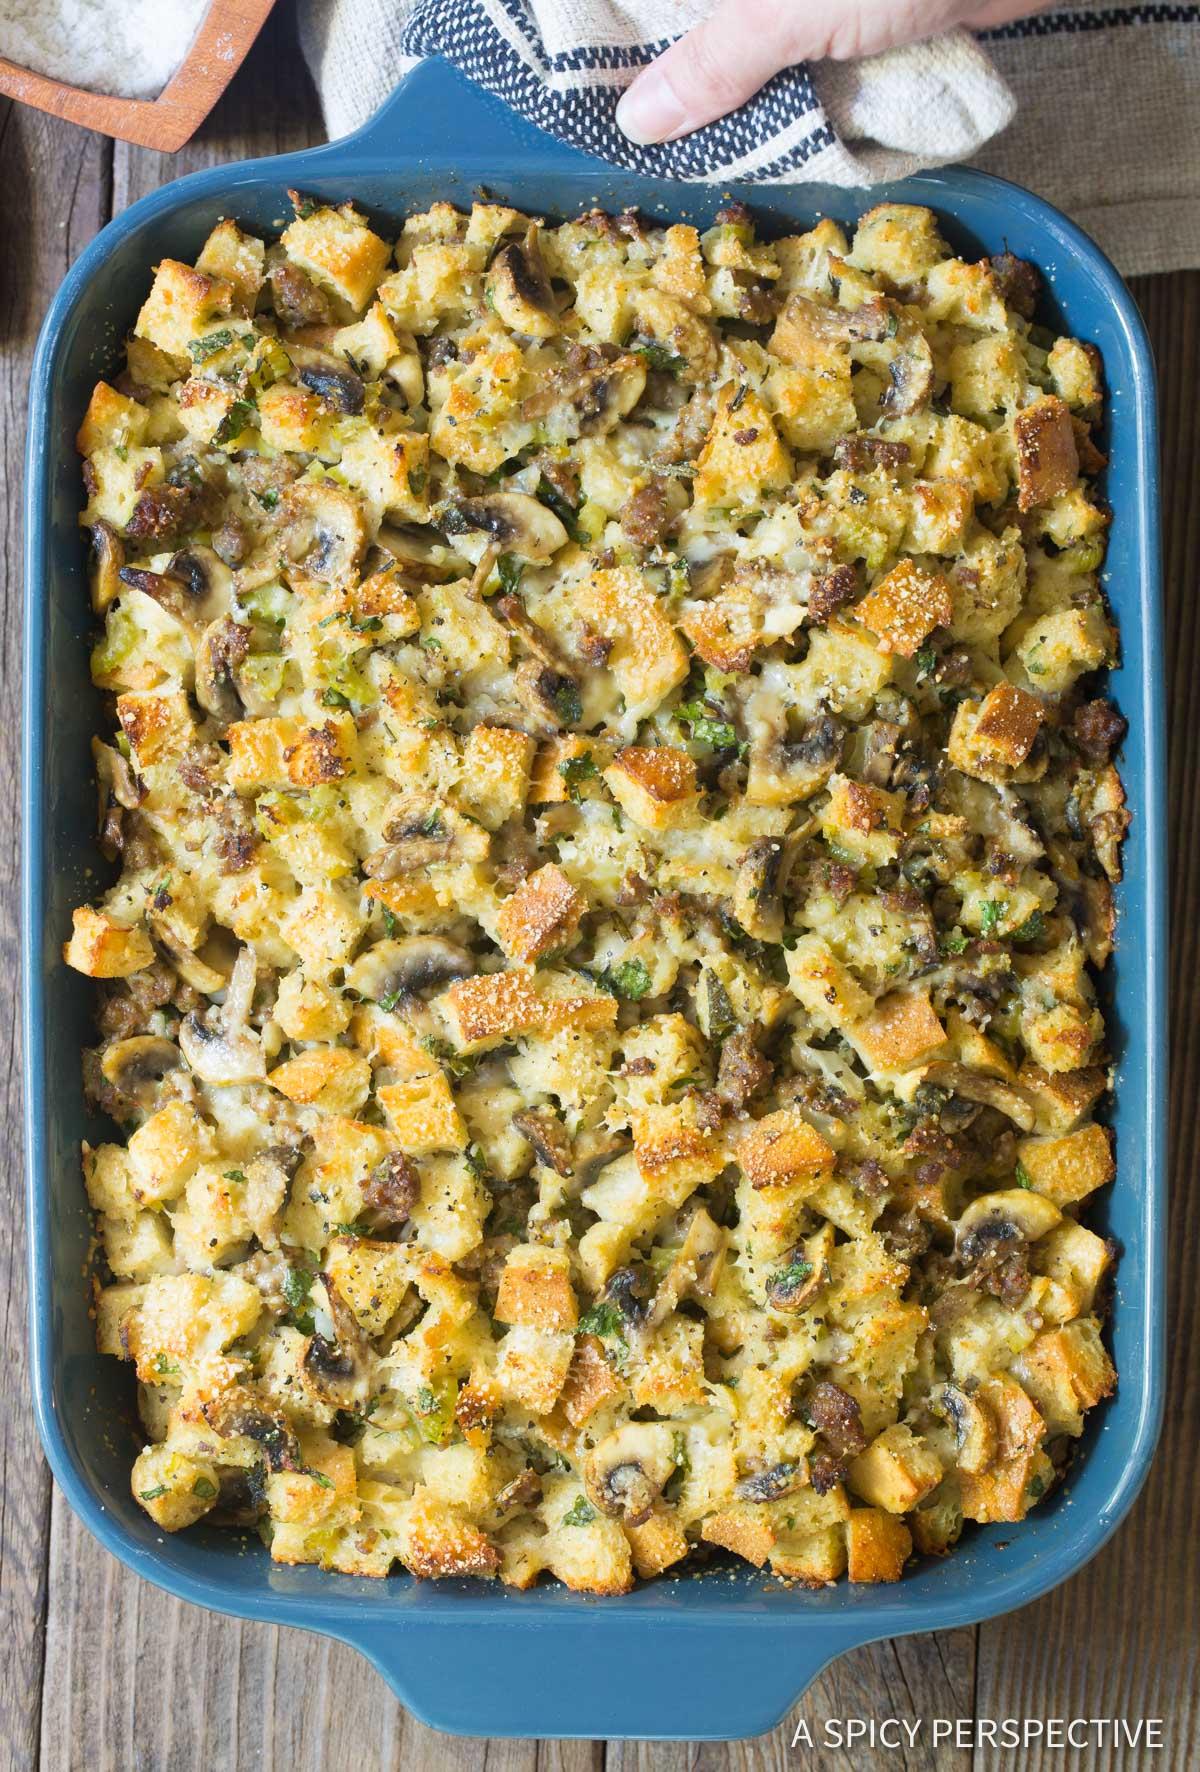 Perfect Sausage Mushroom Thanksgiving Stuffing Recipe #ASpicyPerspective #holiday #dressing